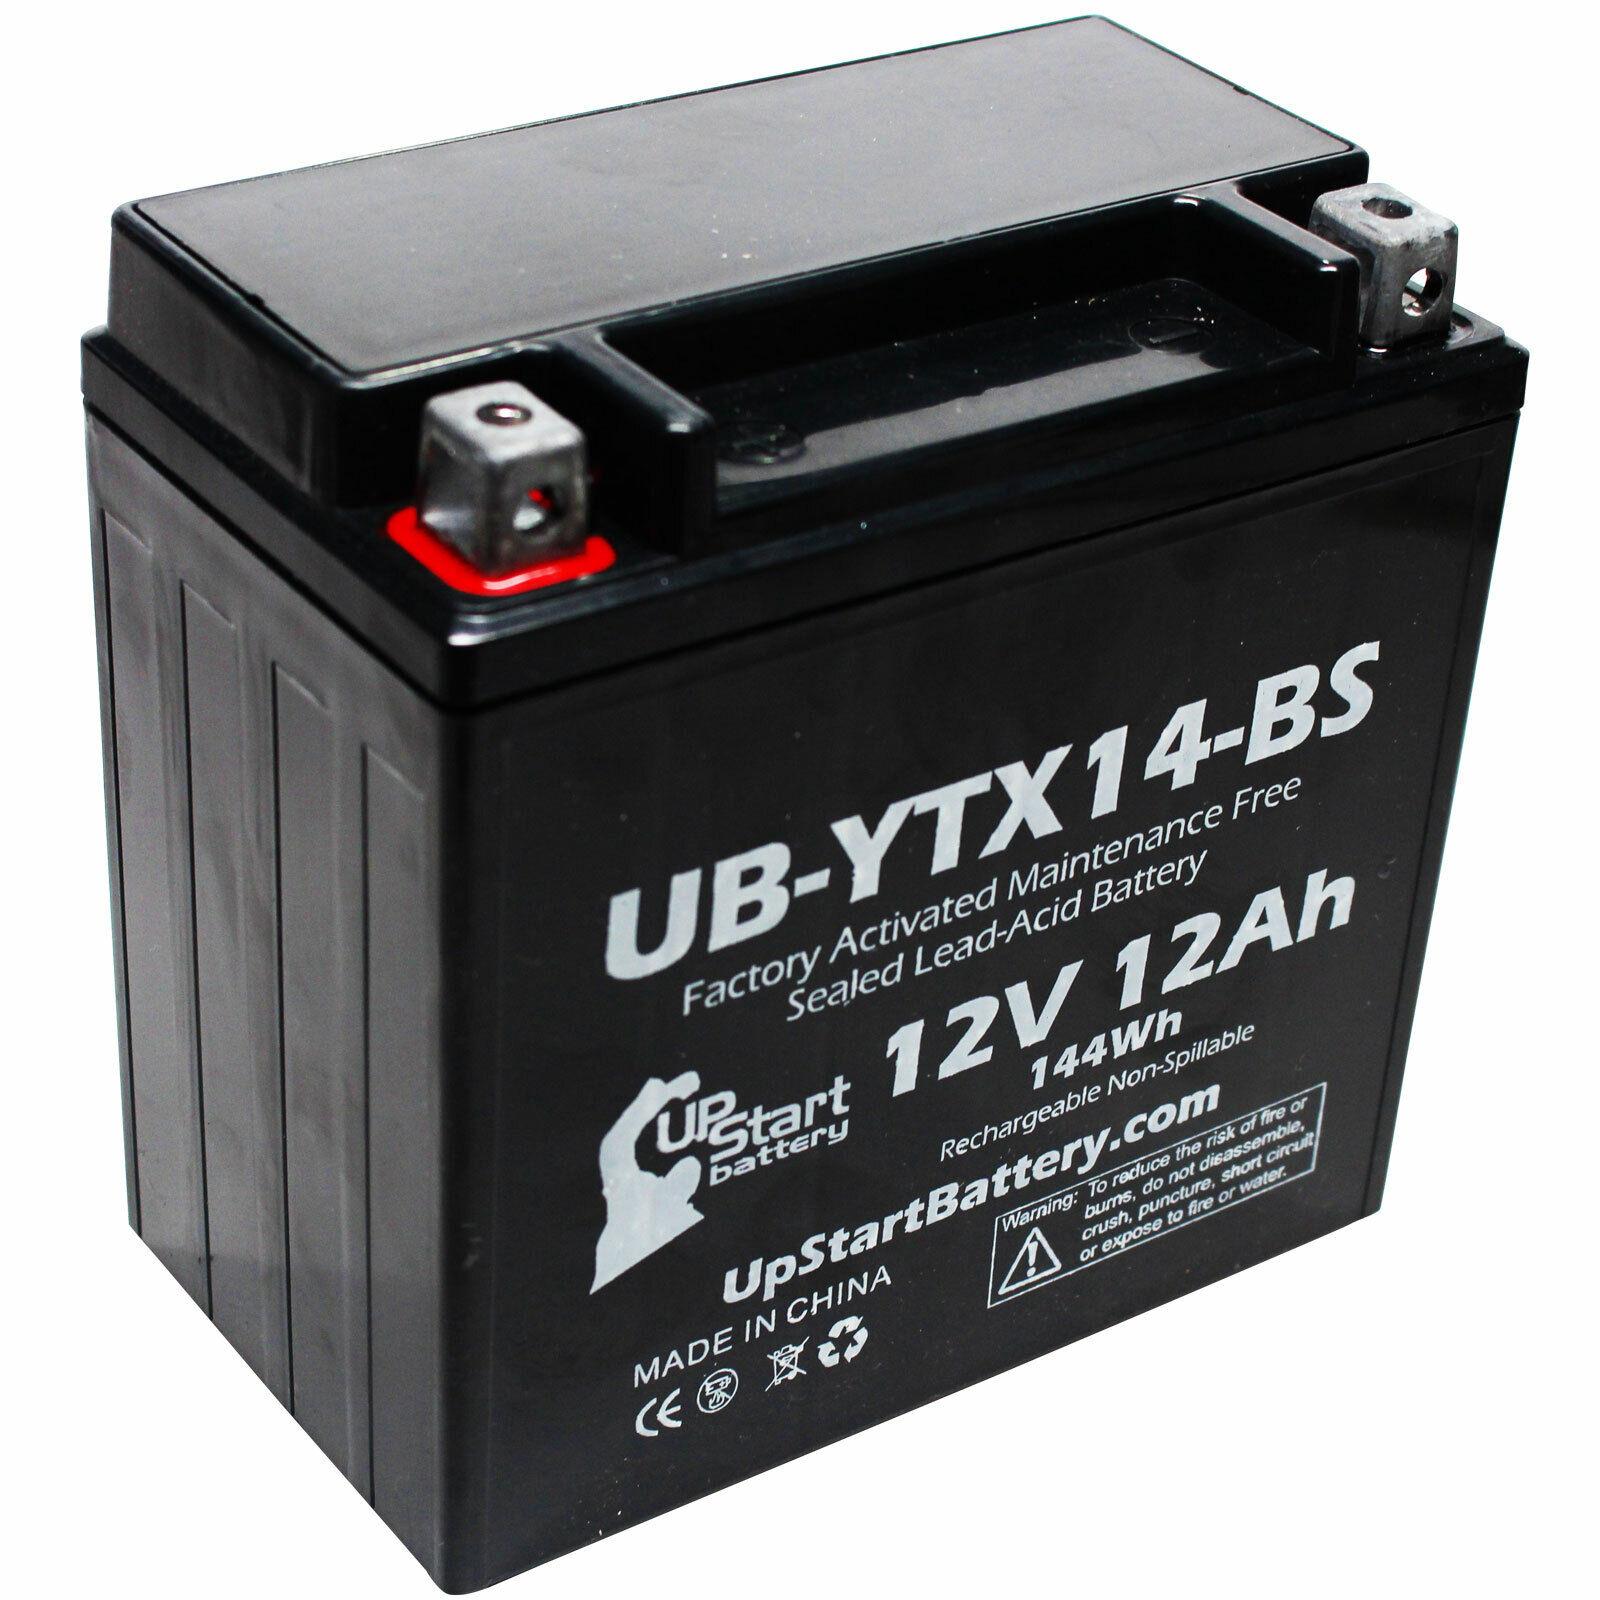 12V 12AH Battery for 2001 Honda TRX400FW Foreman 400 CC